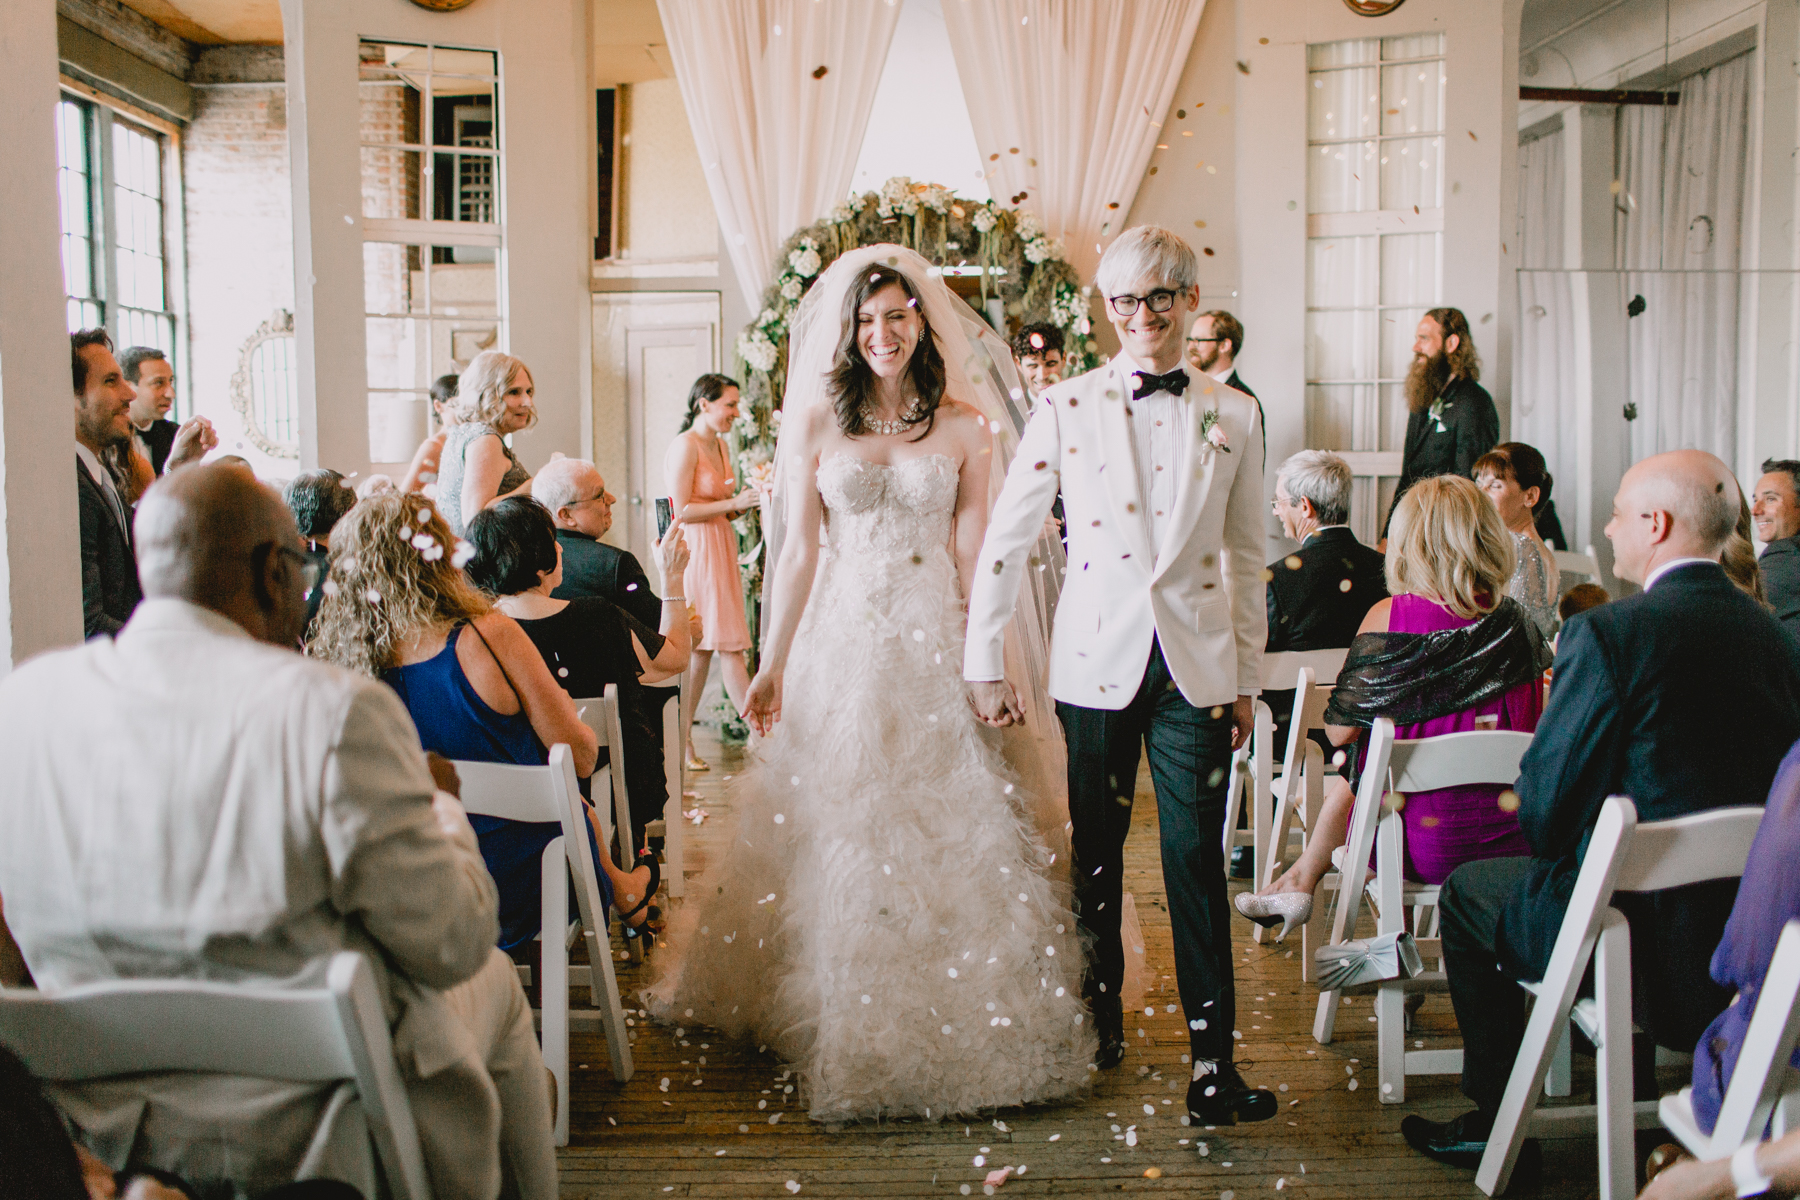 Heather & Justin's Wedding - The Metropolitan Building (New York)